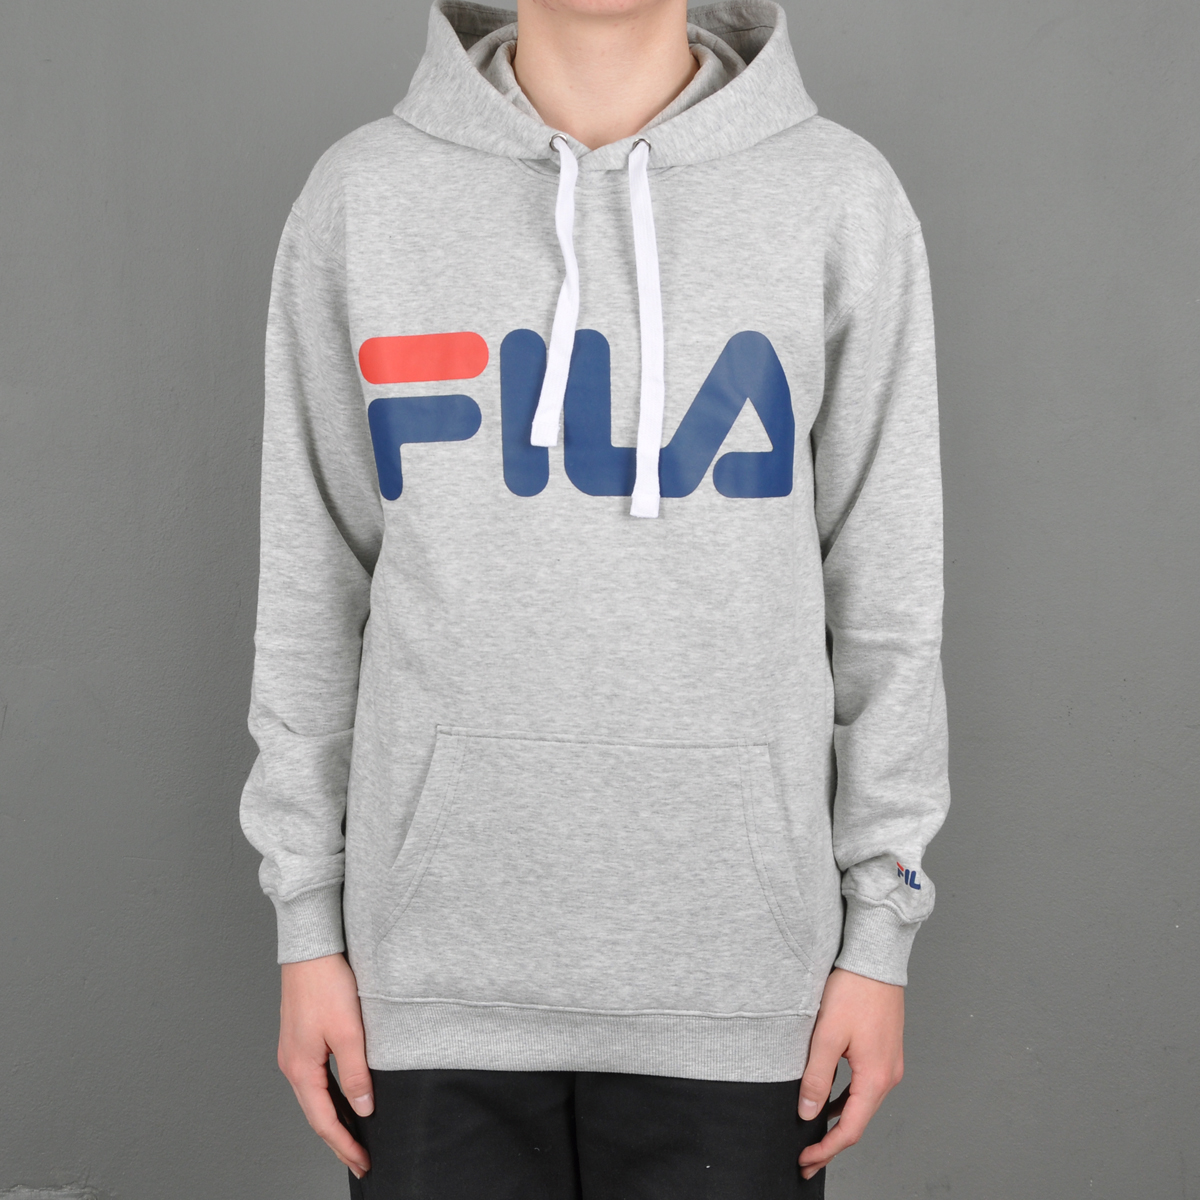 3c4c525bdf2a Clothing ». Fila Classic Logo hood, light grey melange. 1